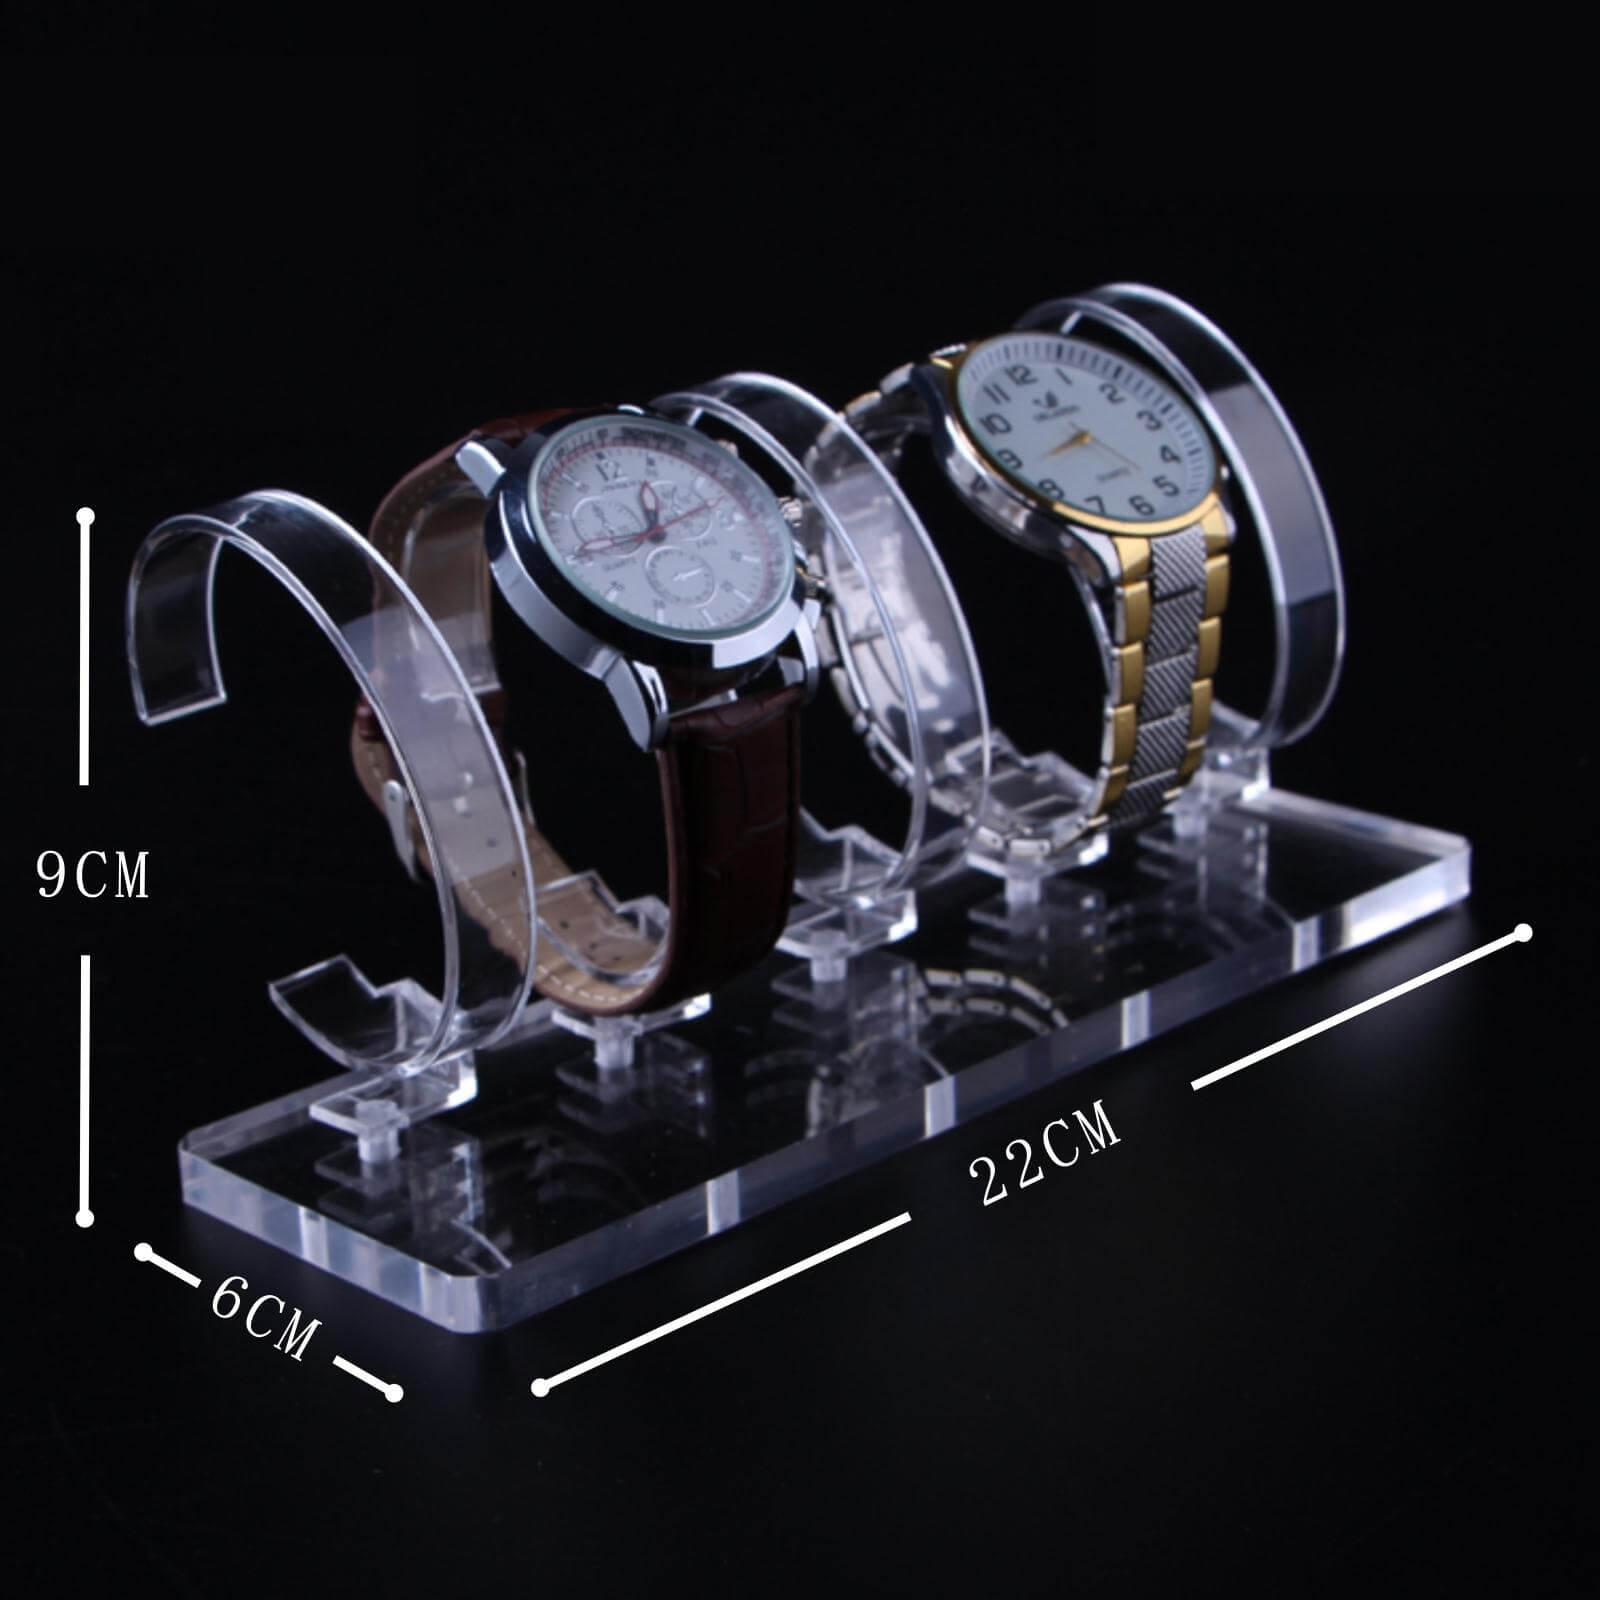 Acrylic Watch Display Stand